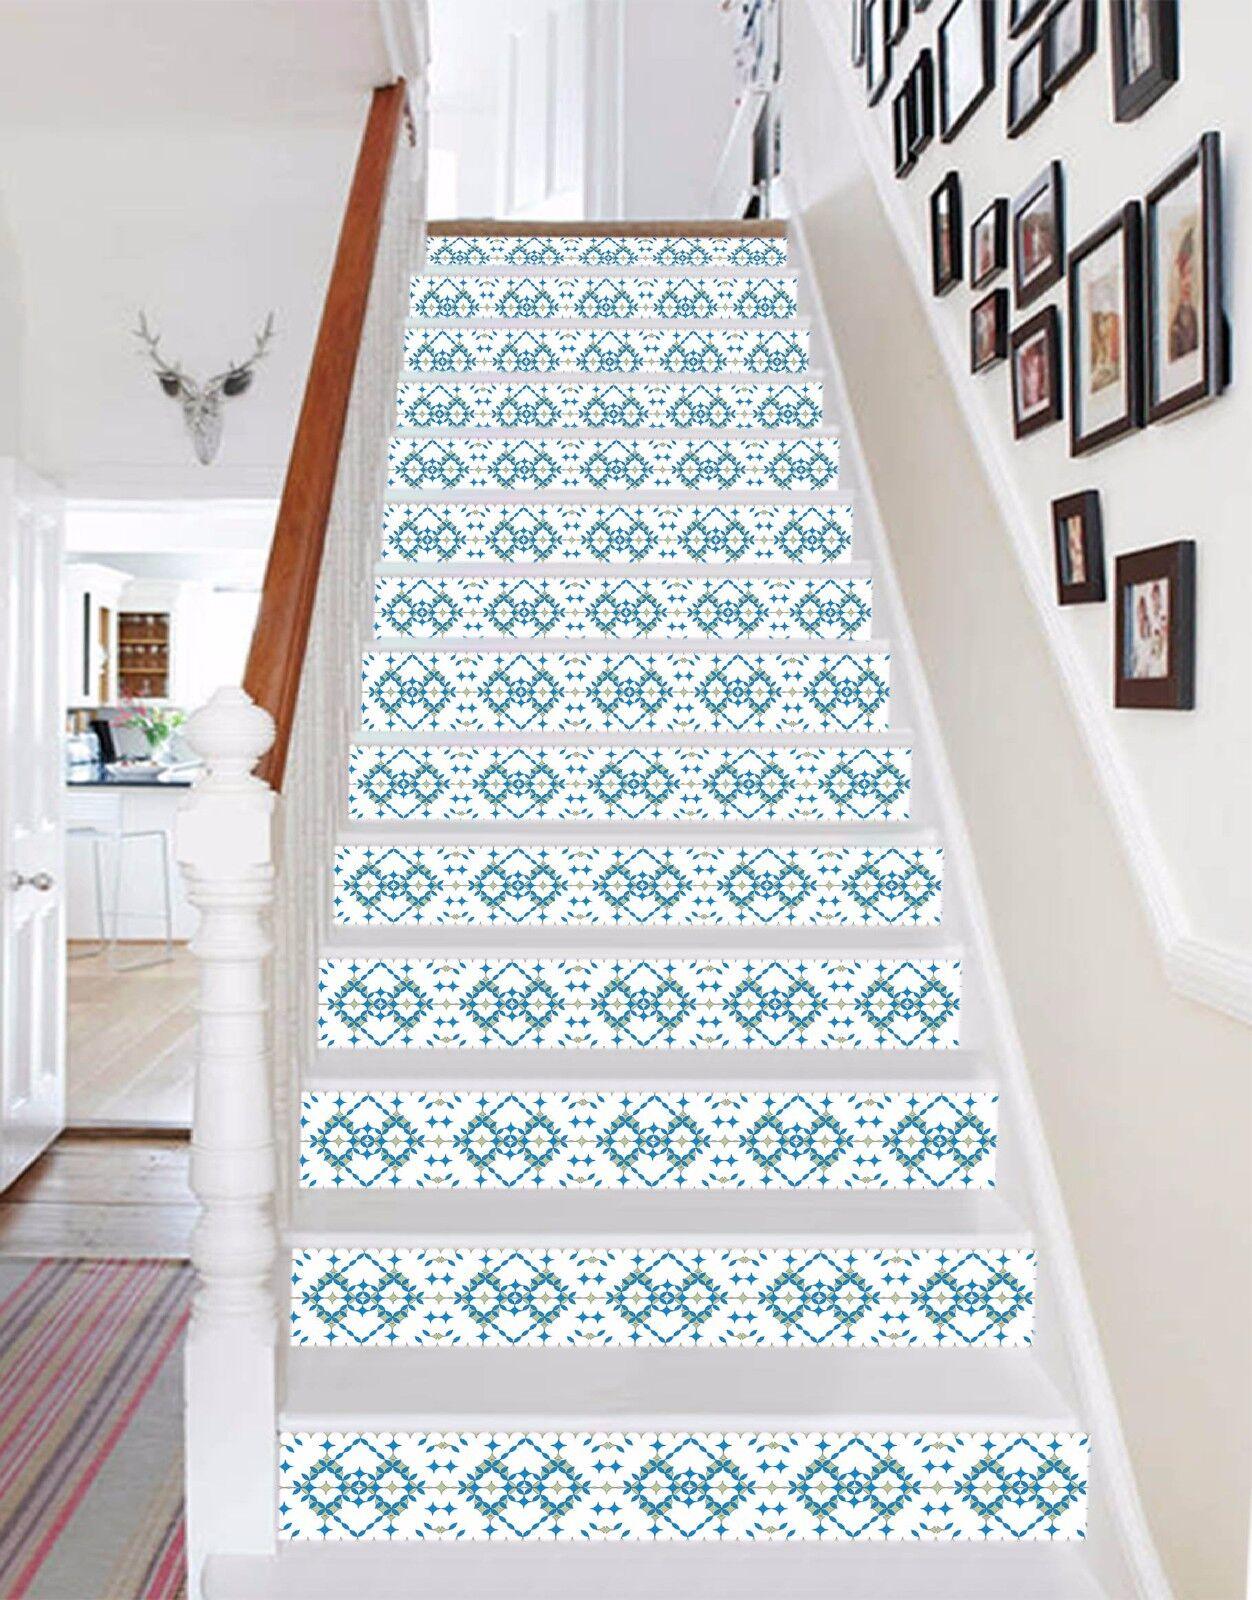 3D Schöne Muster 05 Stair Risers Dekoration Fototapete Vinyl Aufkleber Tapete DE